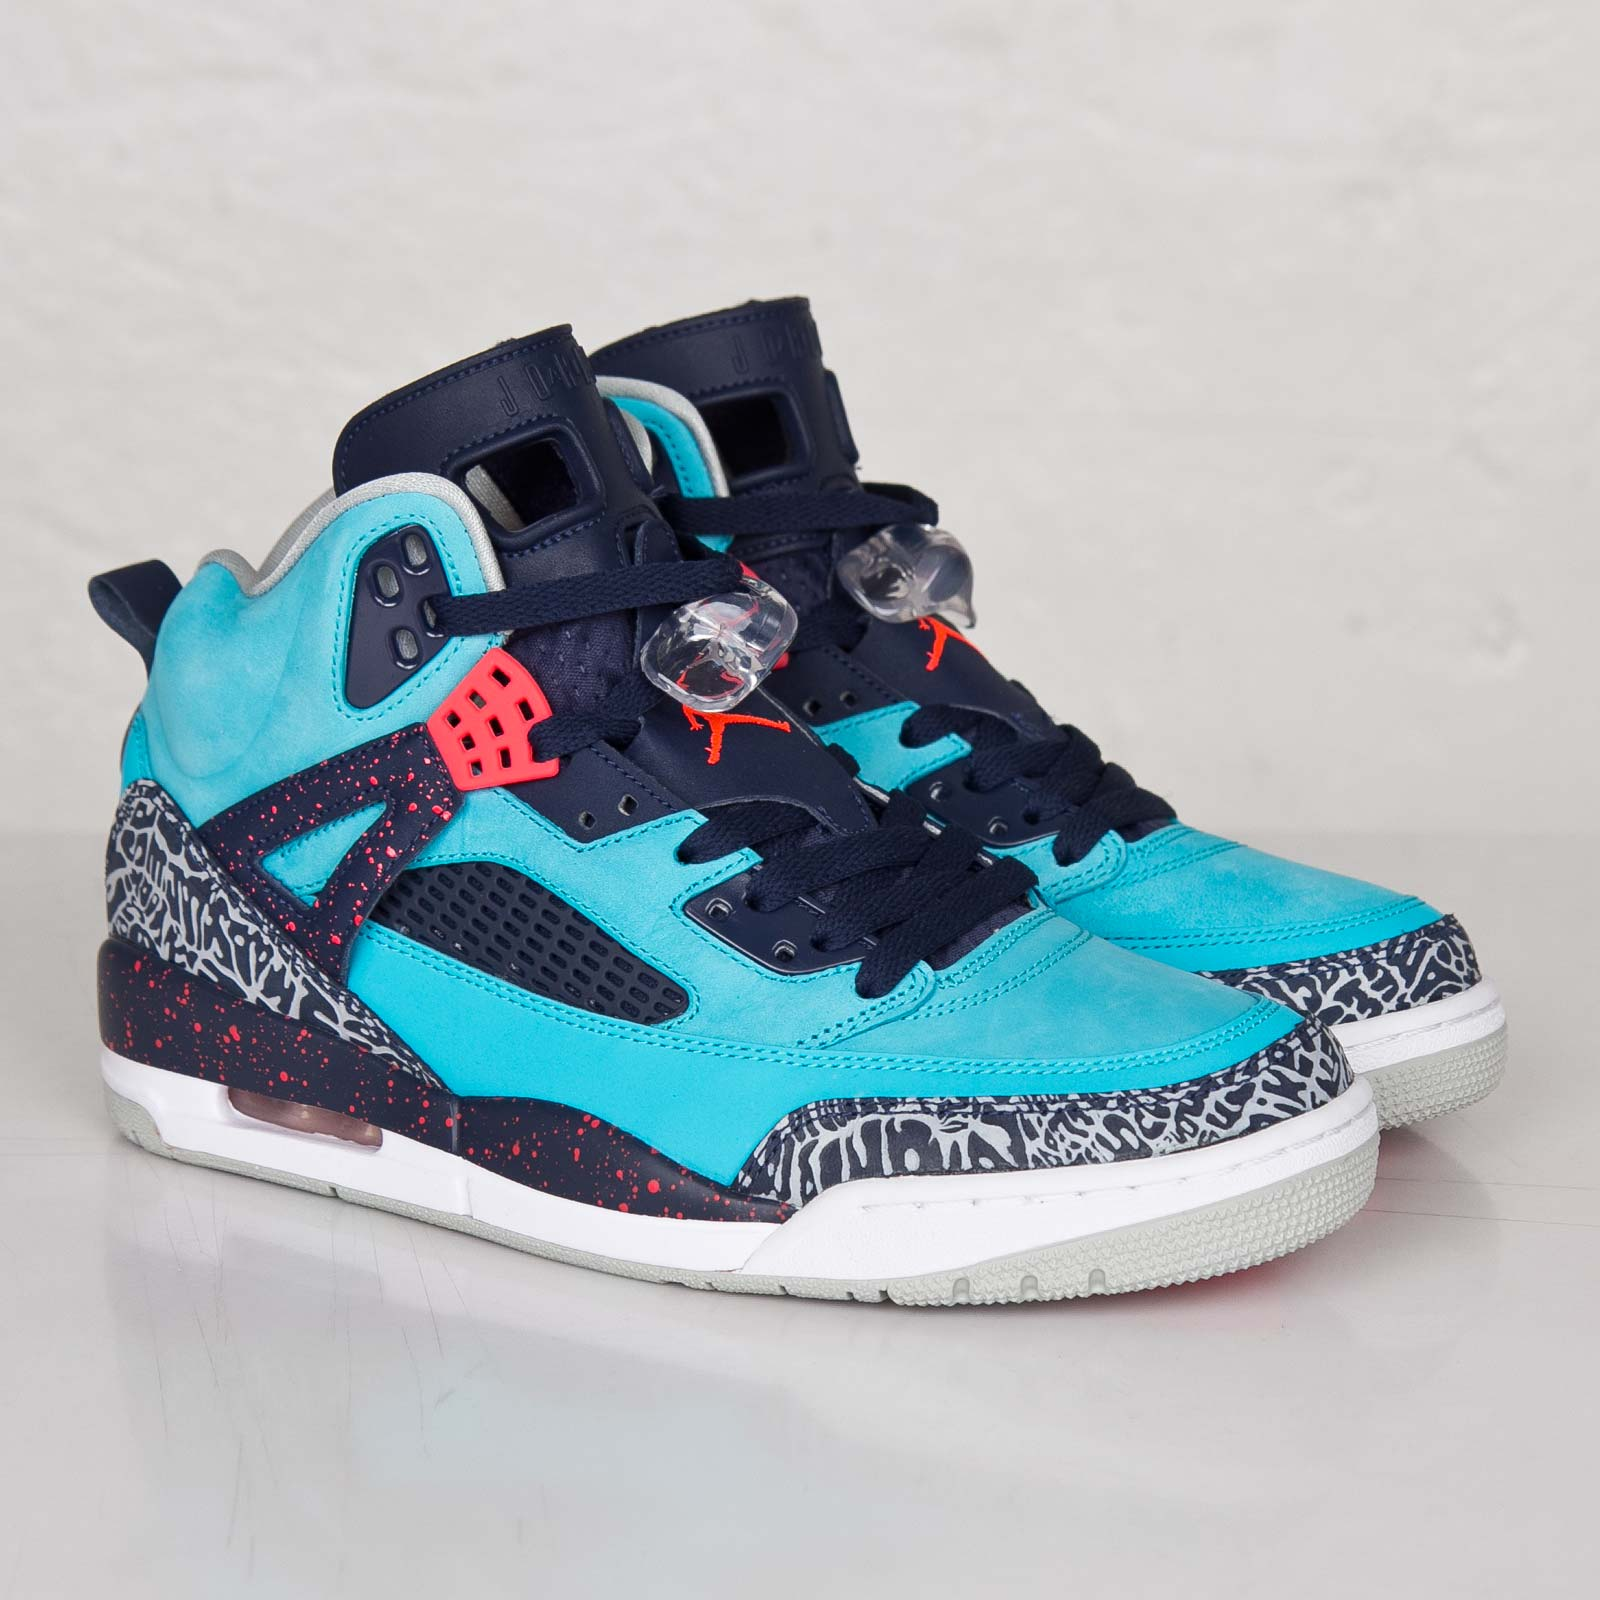 42e8d433a61 Jordan Brand Jordan Spizike - 315371-408 - Sneakersnstuff   sneakers ...